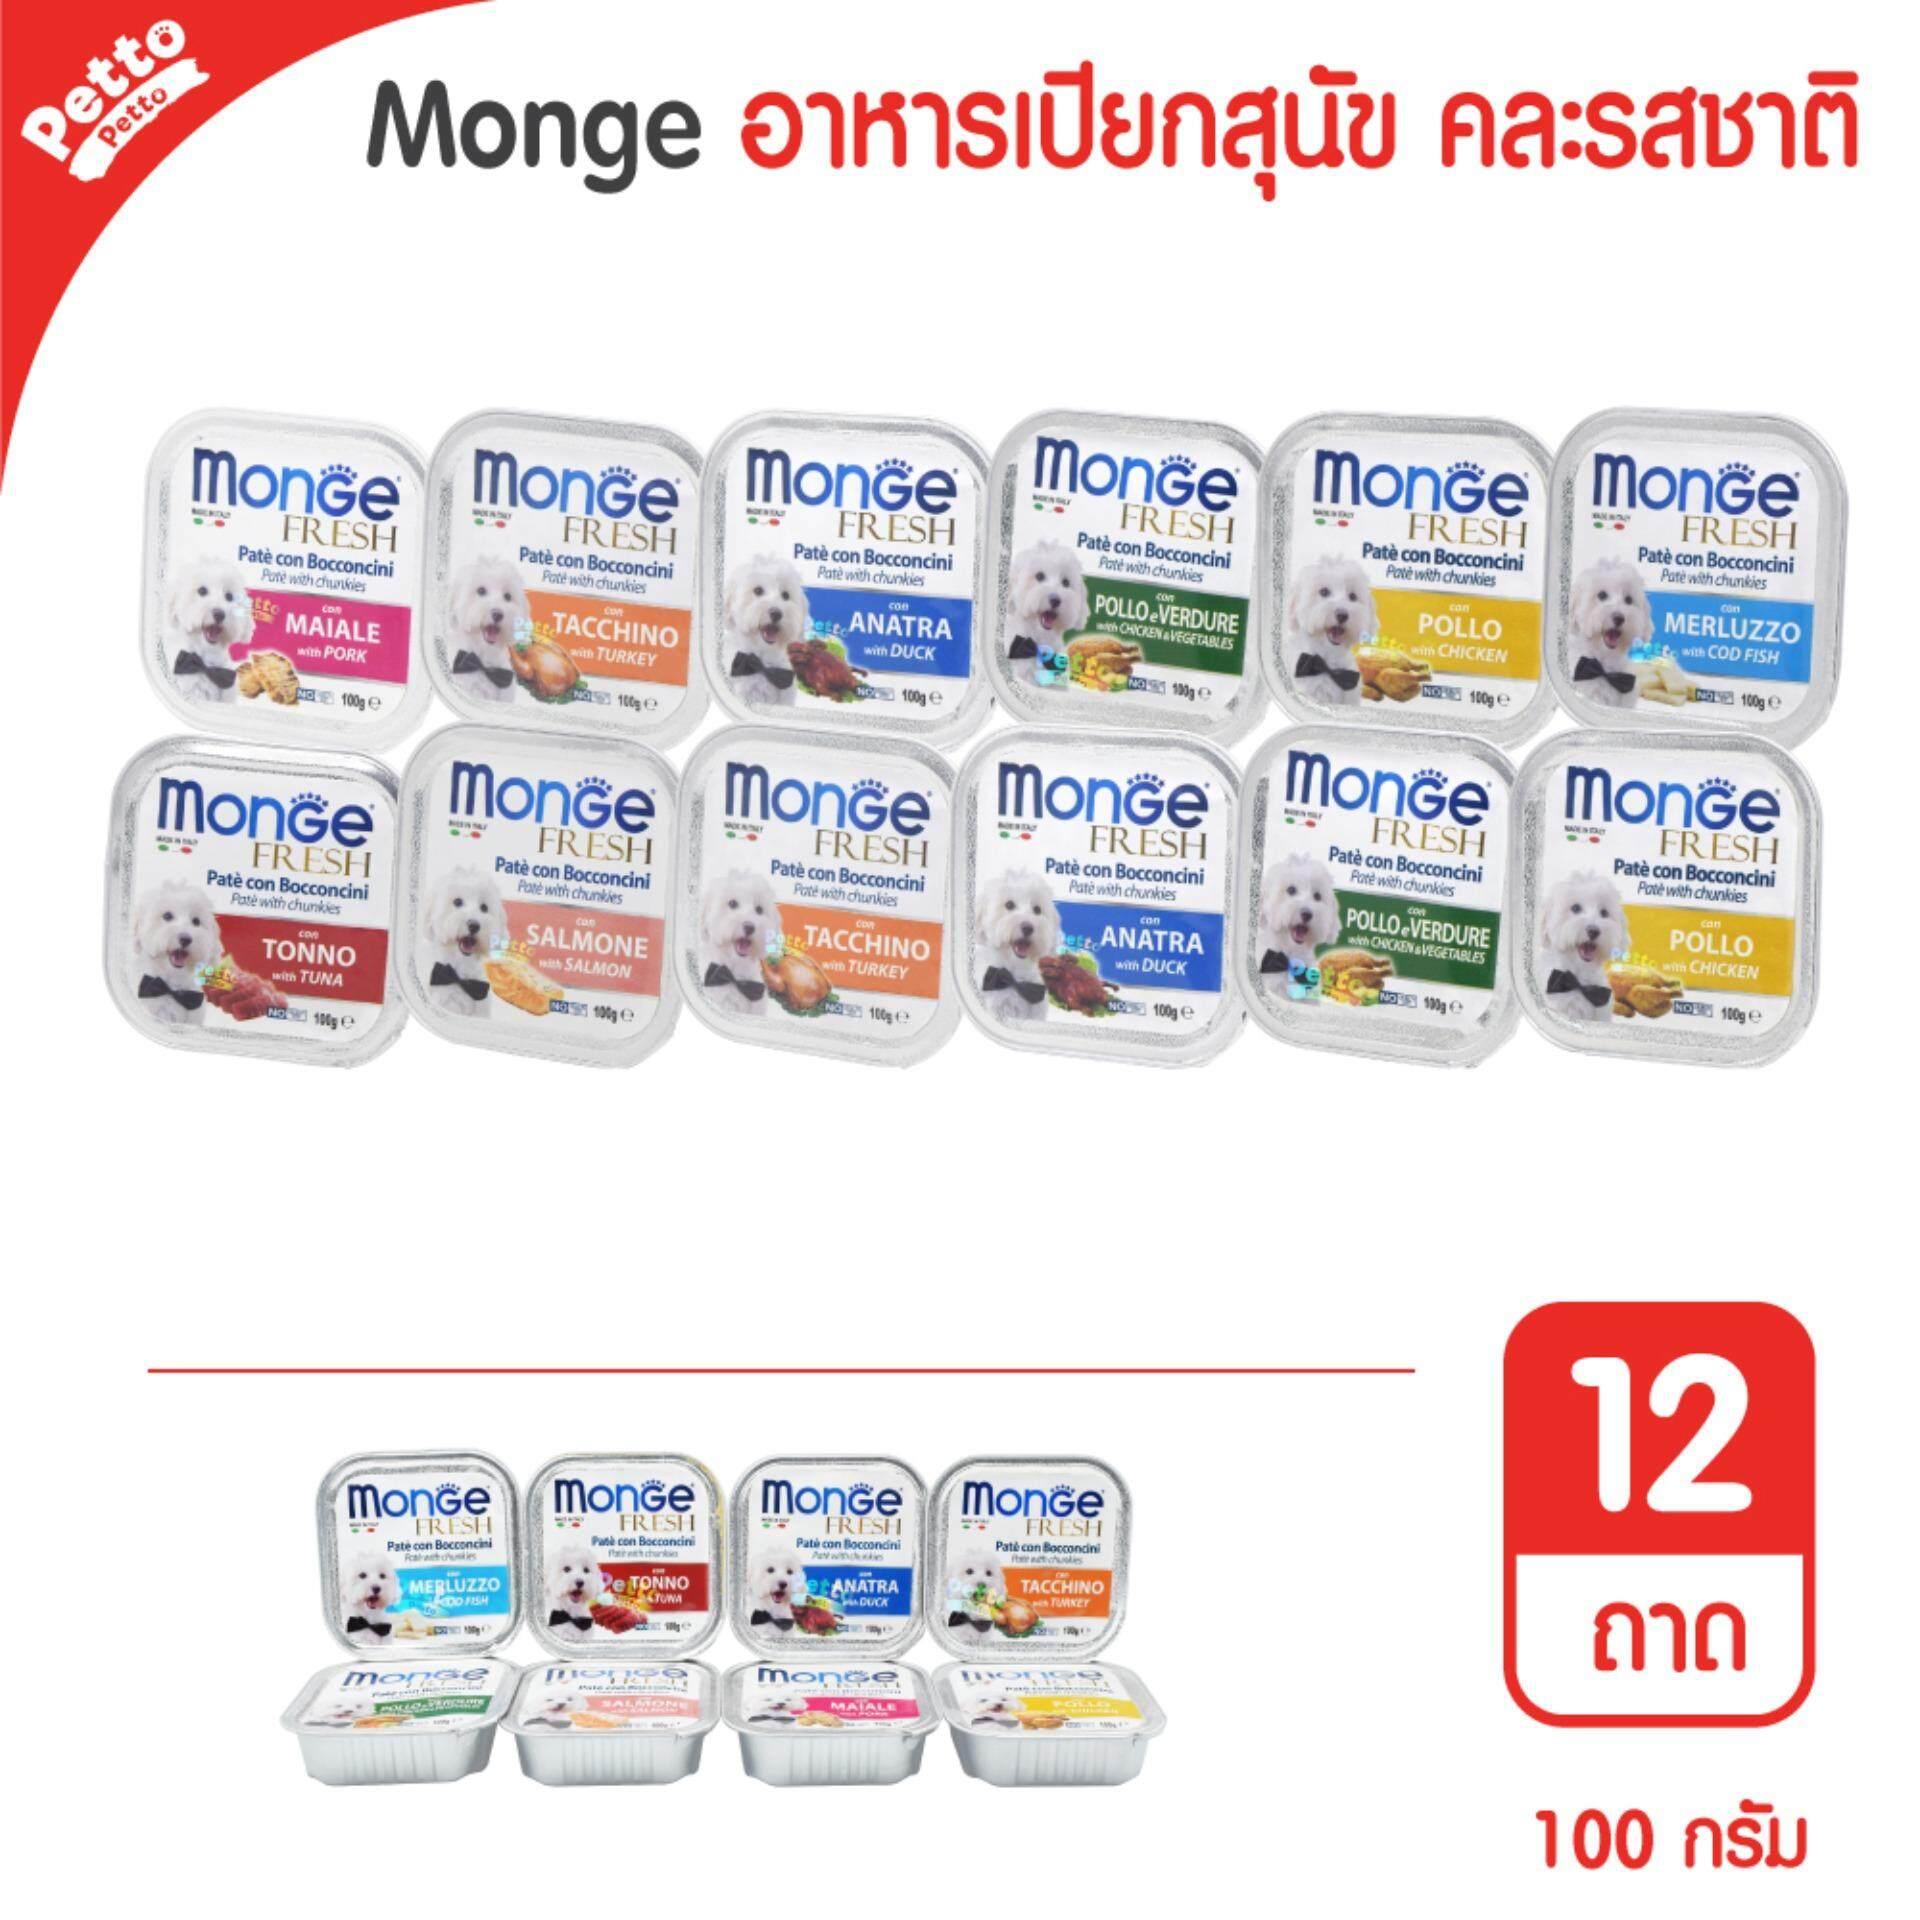 Monge อาหารเปียกสุนัข คละรสชาติ (แบบถาด) 100 กรัม - 12 ชิ้น.